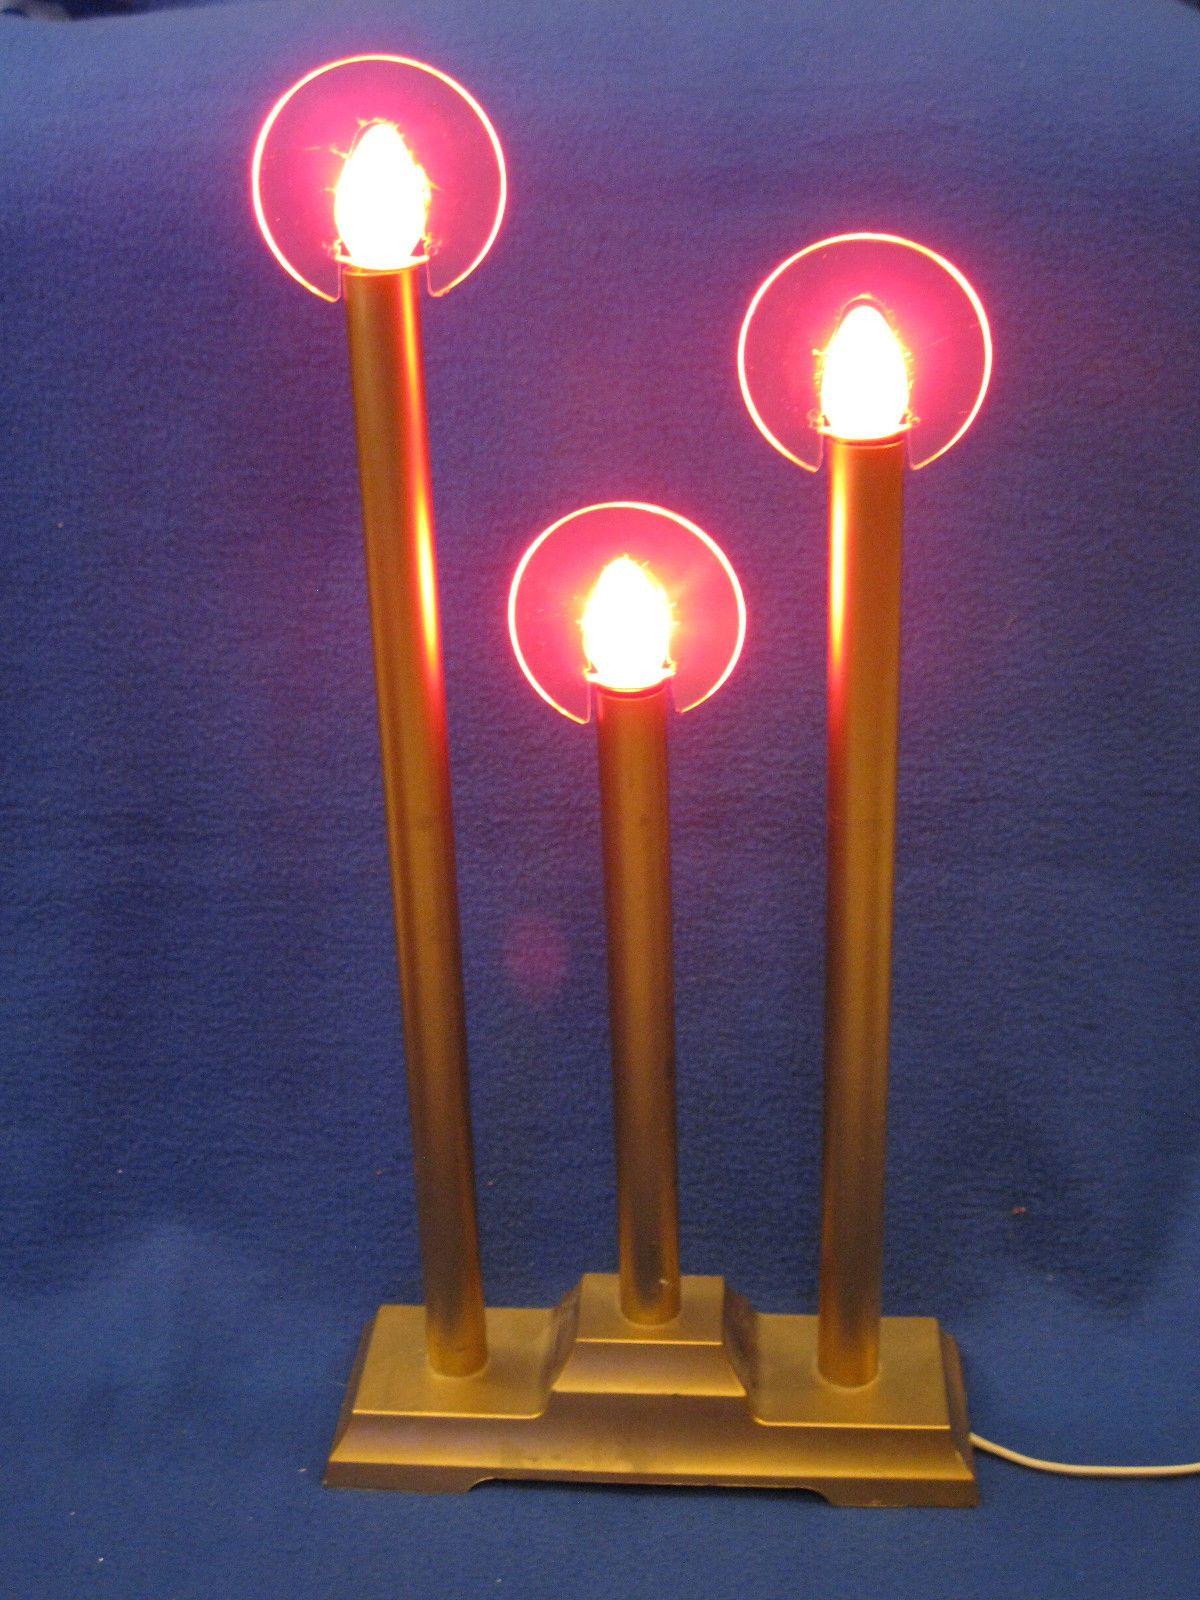 Vintage christmas 3 light haloed candolier candelabra electric gold